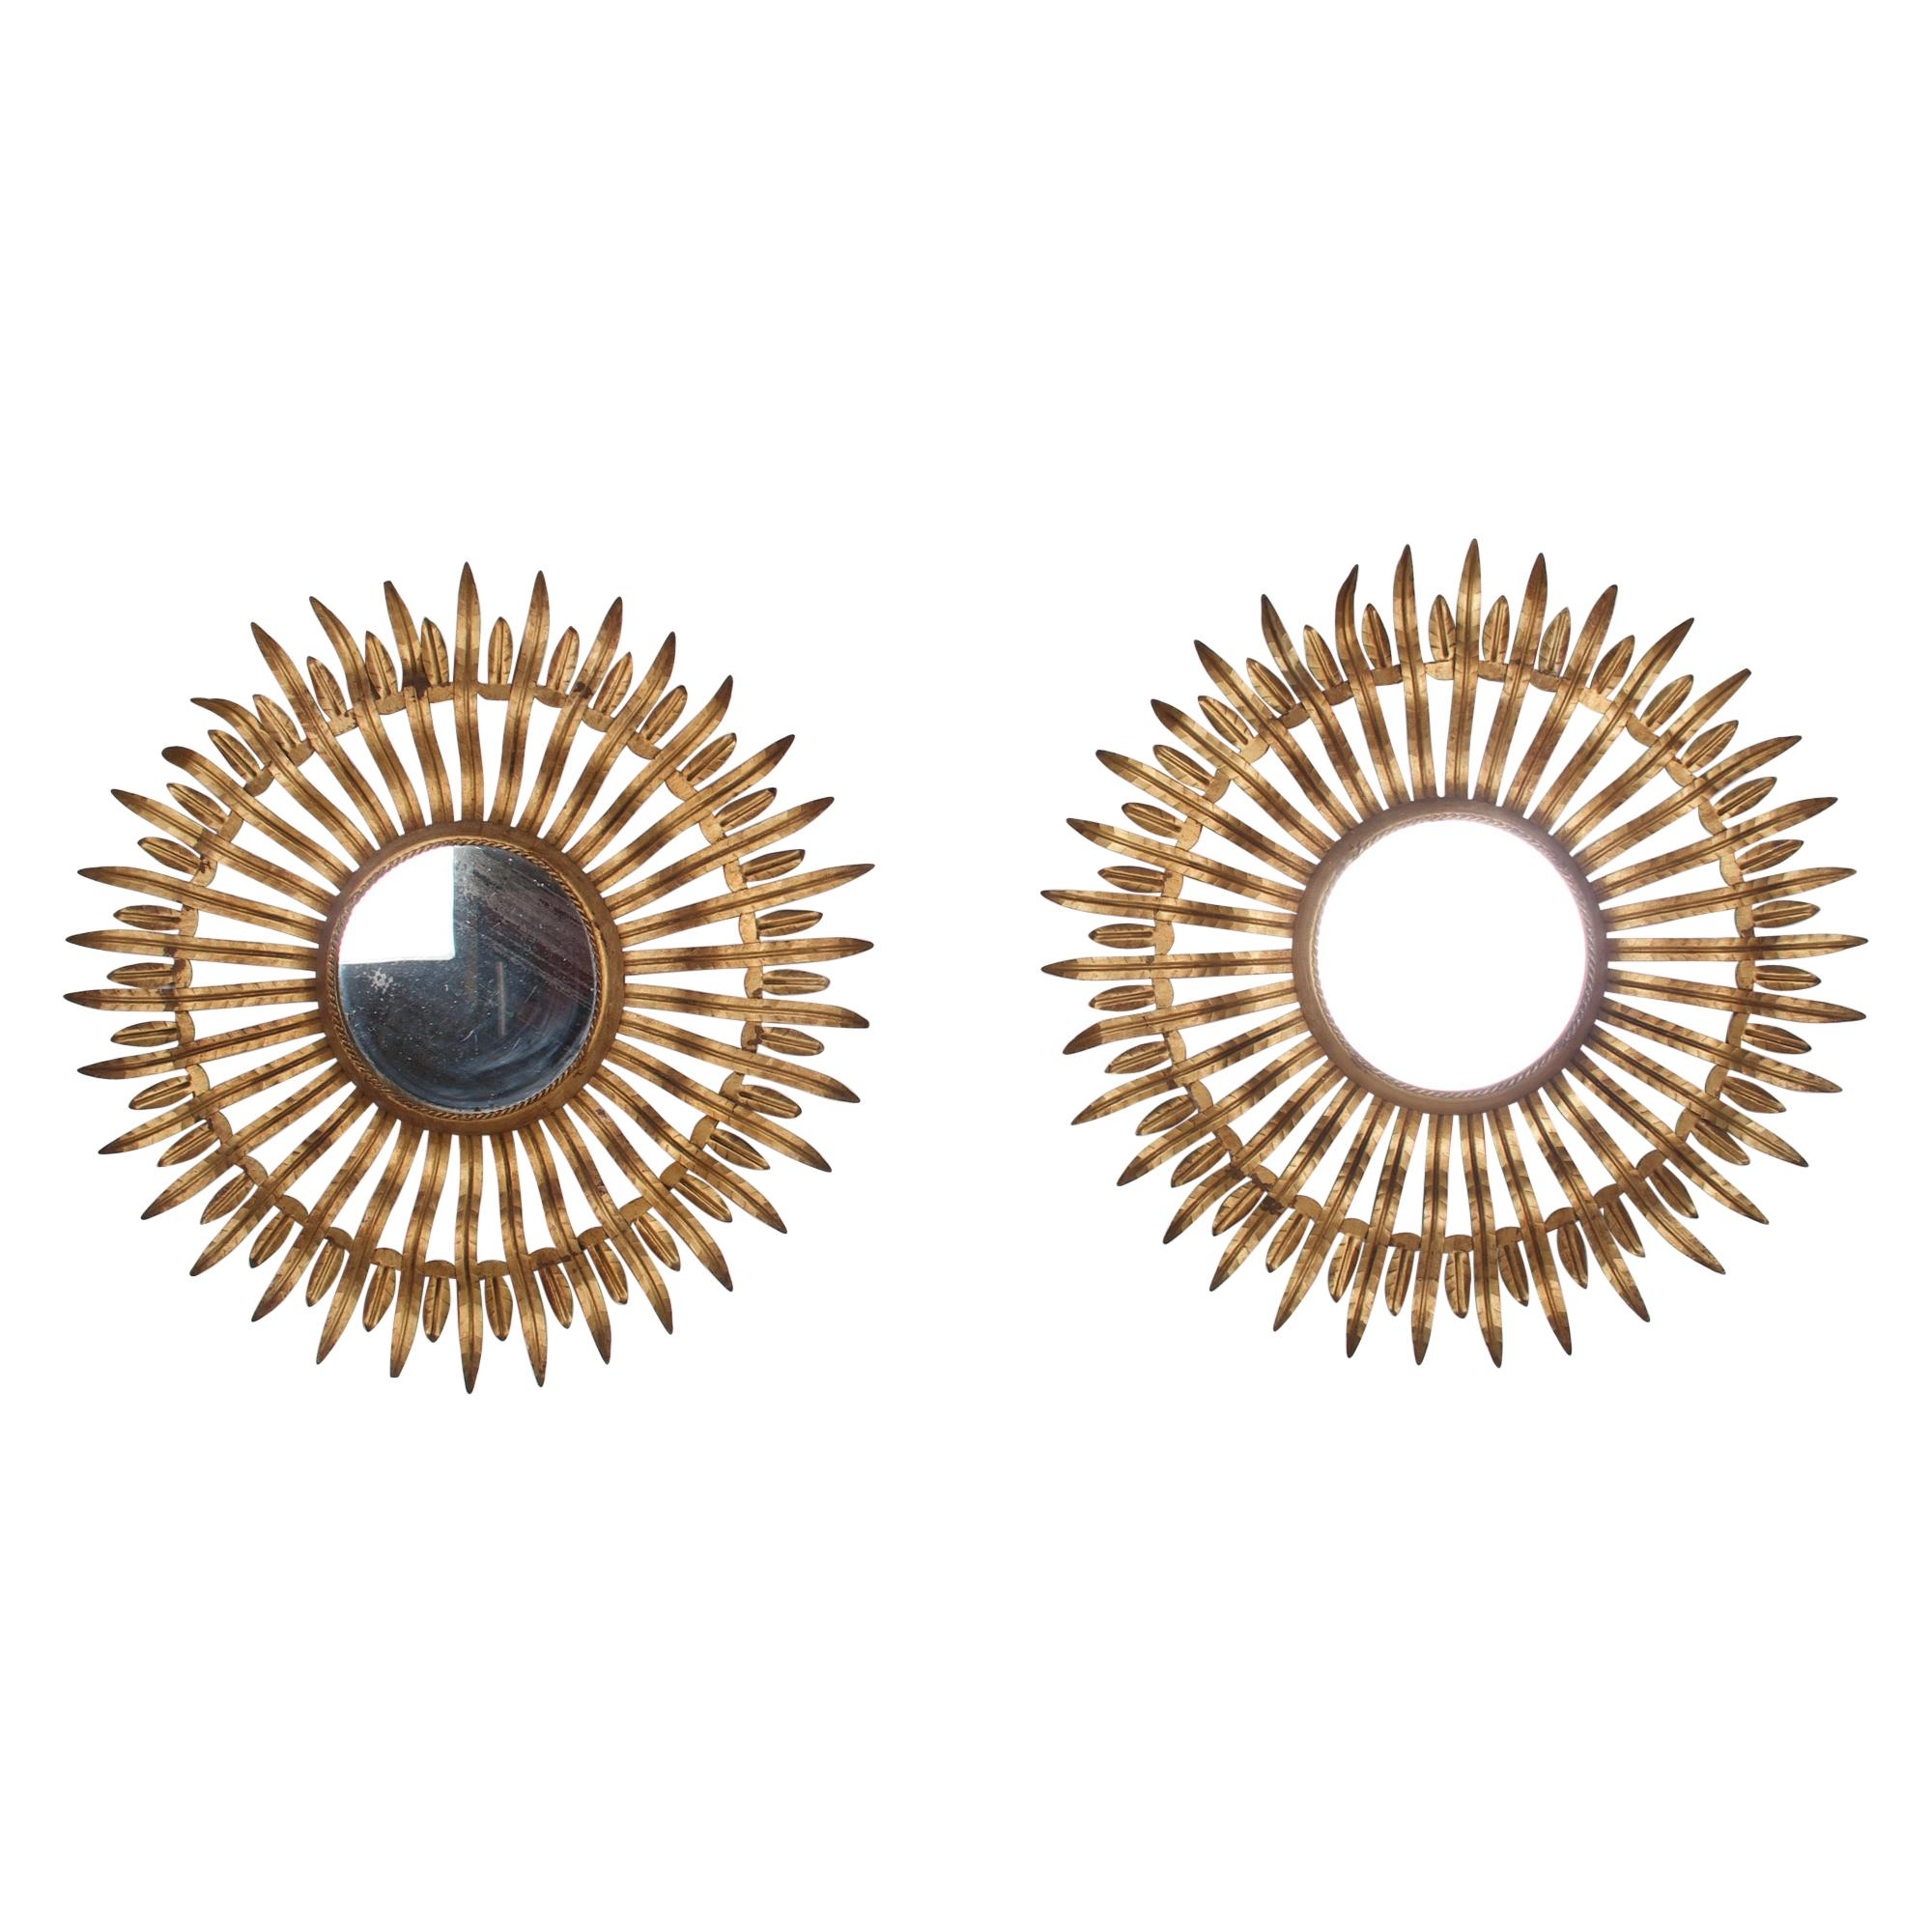 Pair of Midcentury Sunburst Mirrors